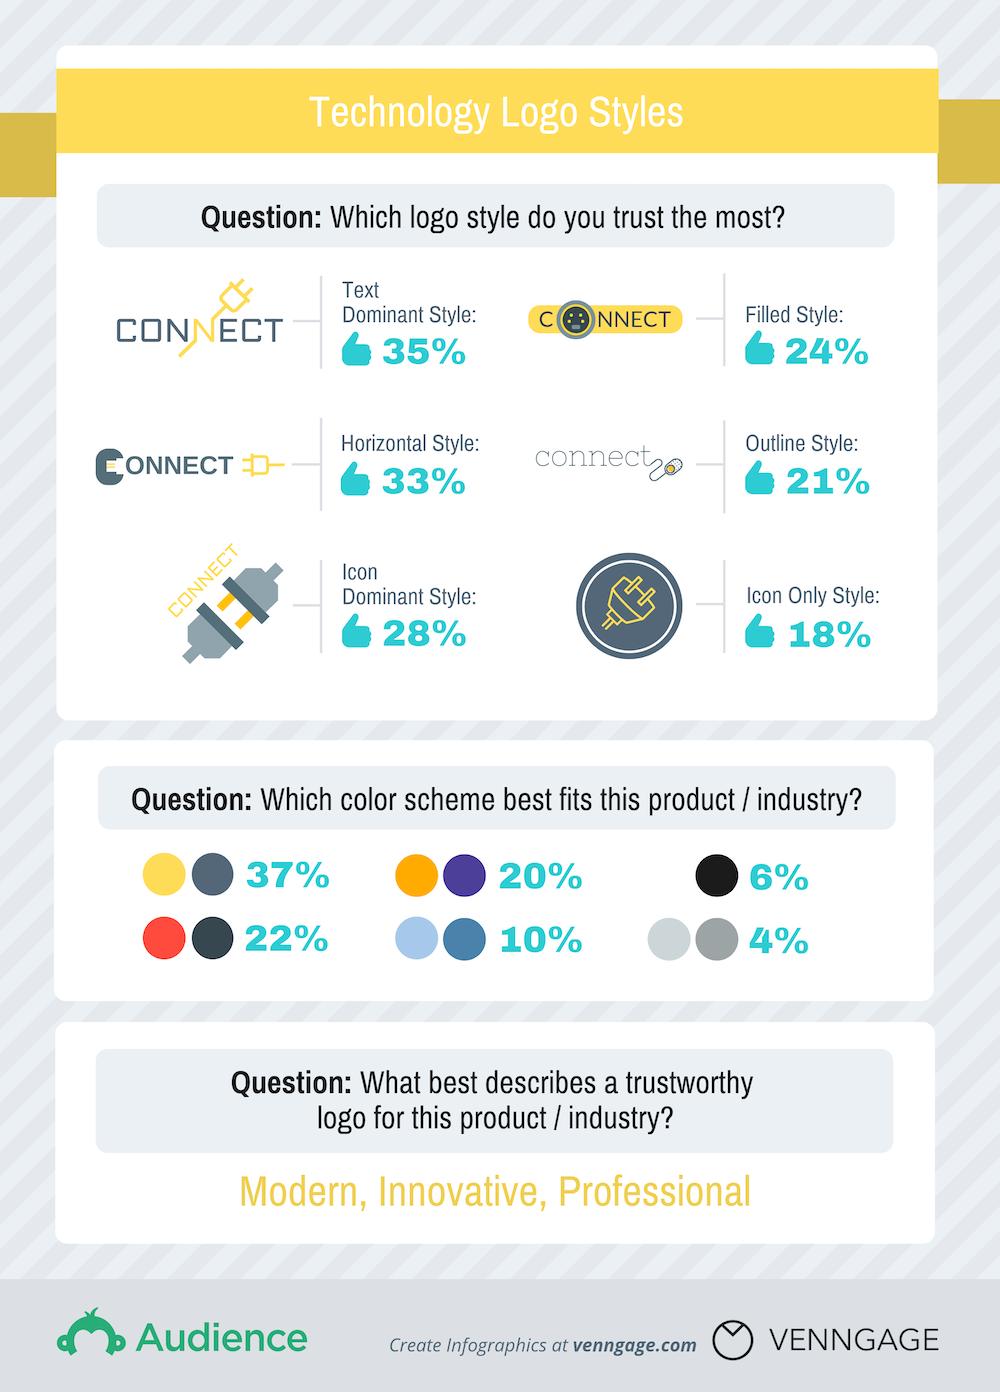 Technology-Logos-Survey-Results